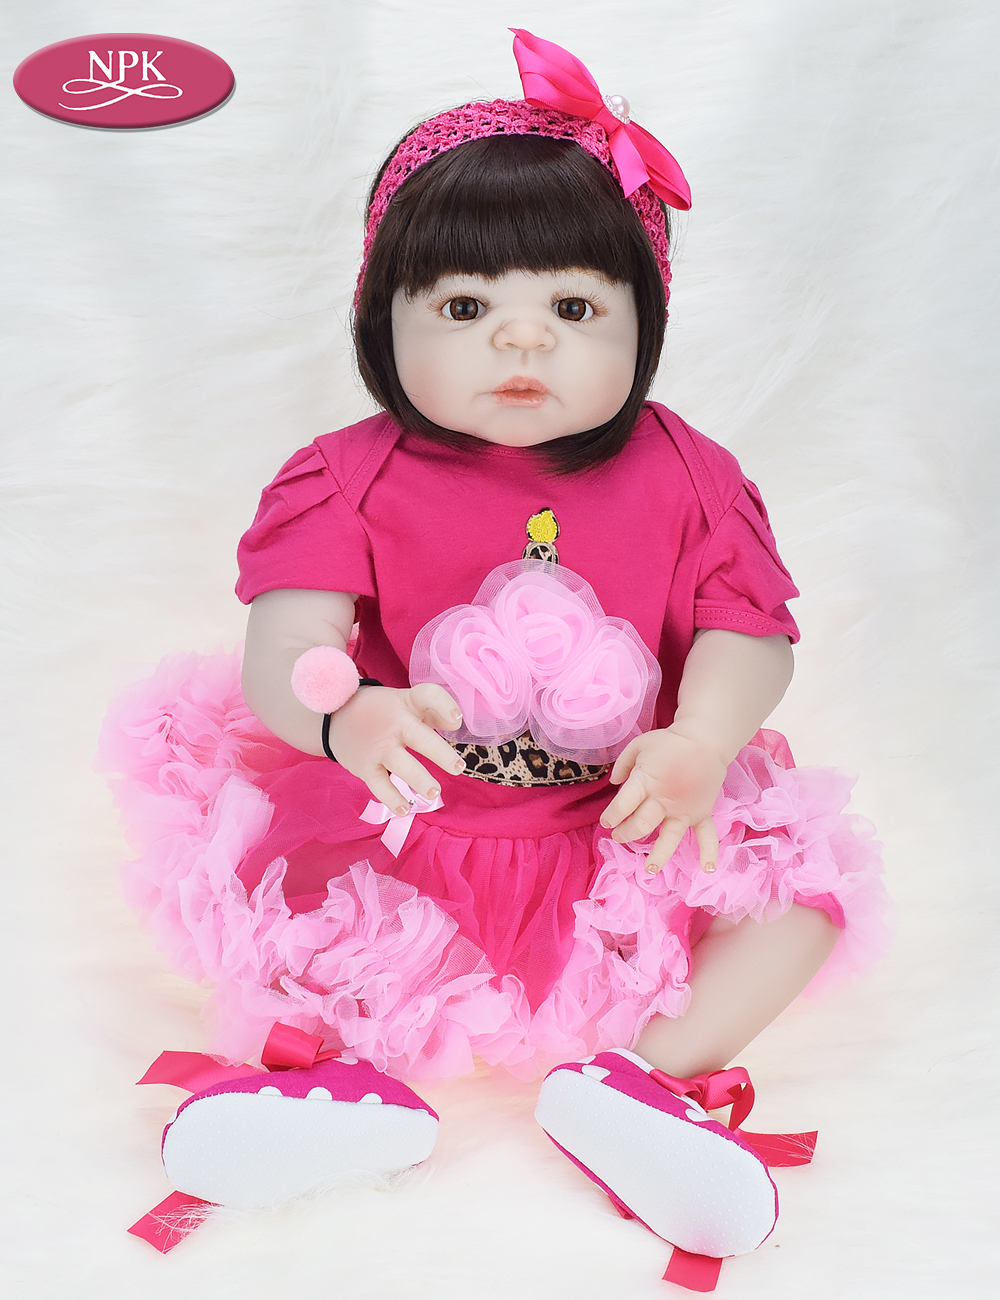 NPK 57CM Full Body Soft Silicone Girls Reborn Baby Doll Bathe Toys Lifelike Princess Girl Dolls Bebe Real Reborn Boneca Menina  (3)